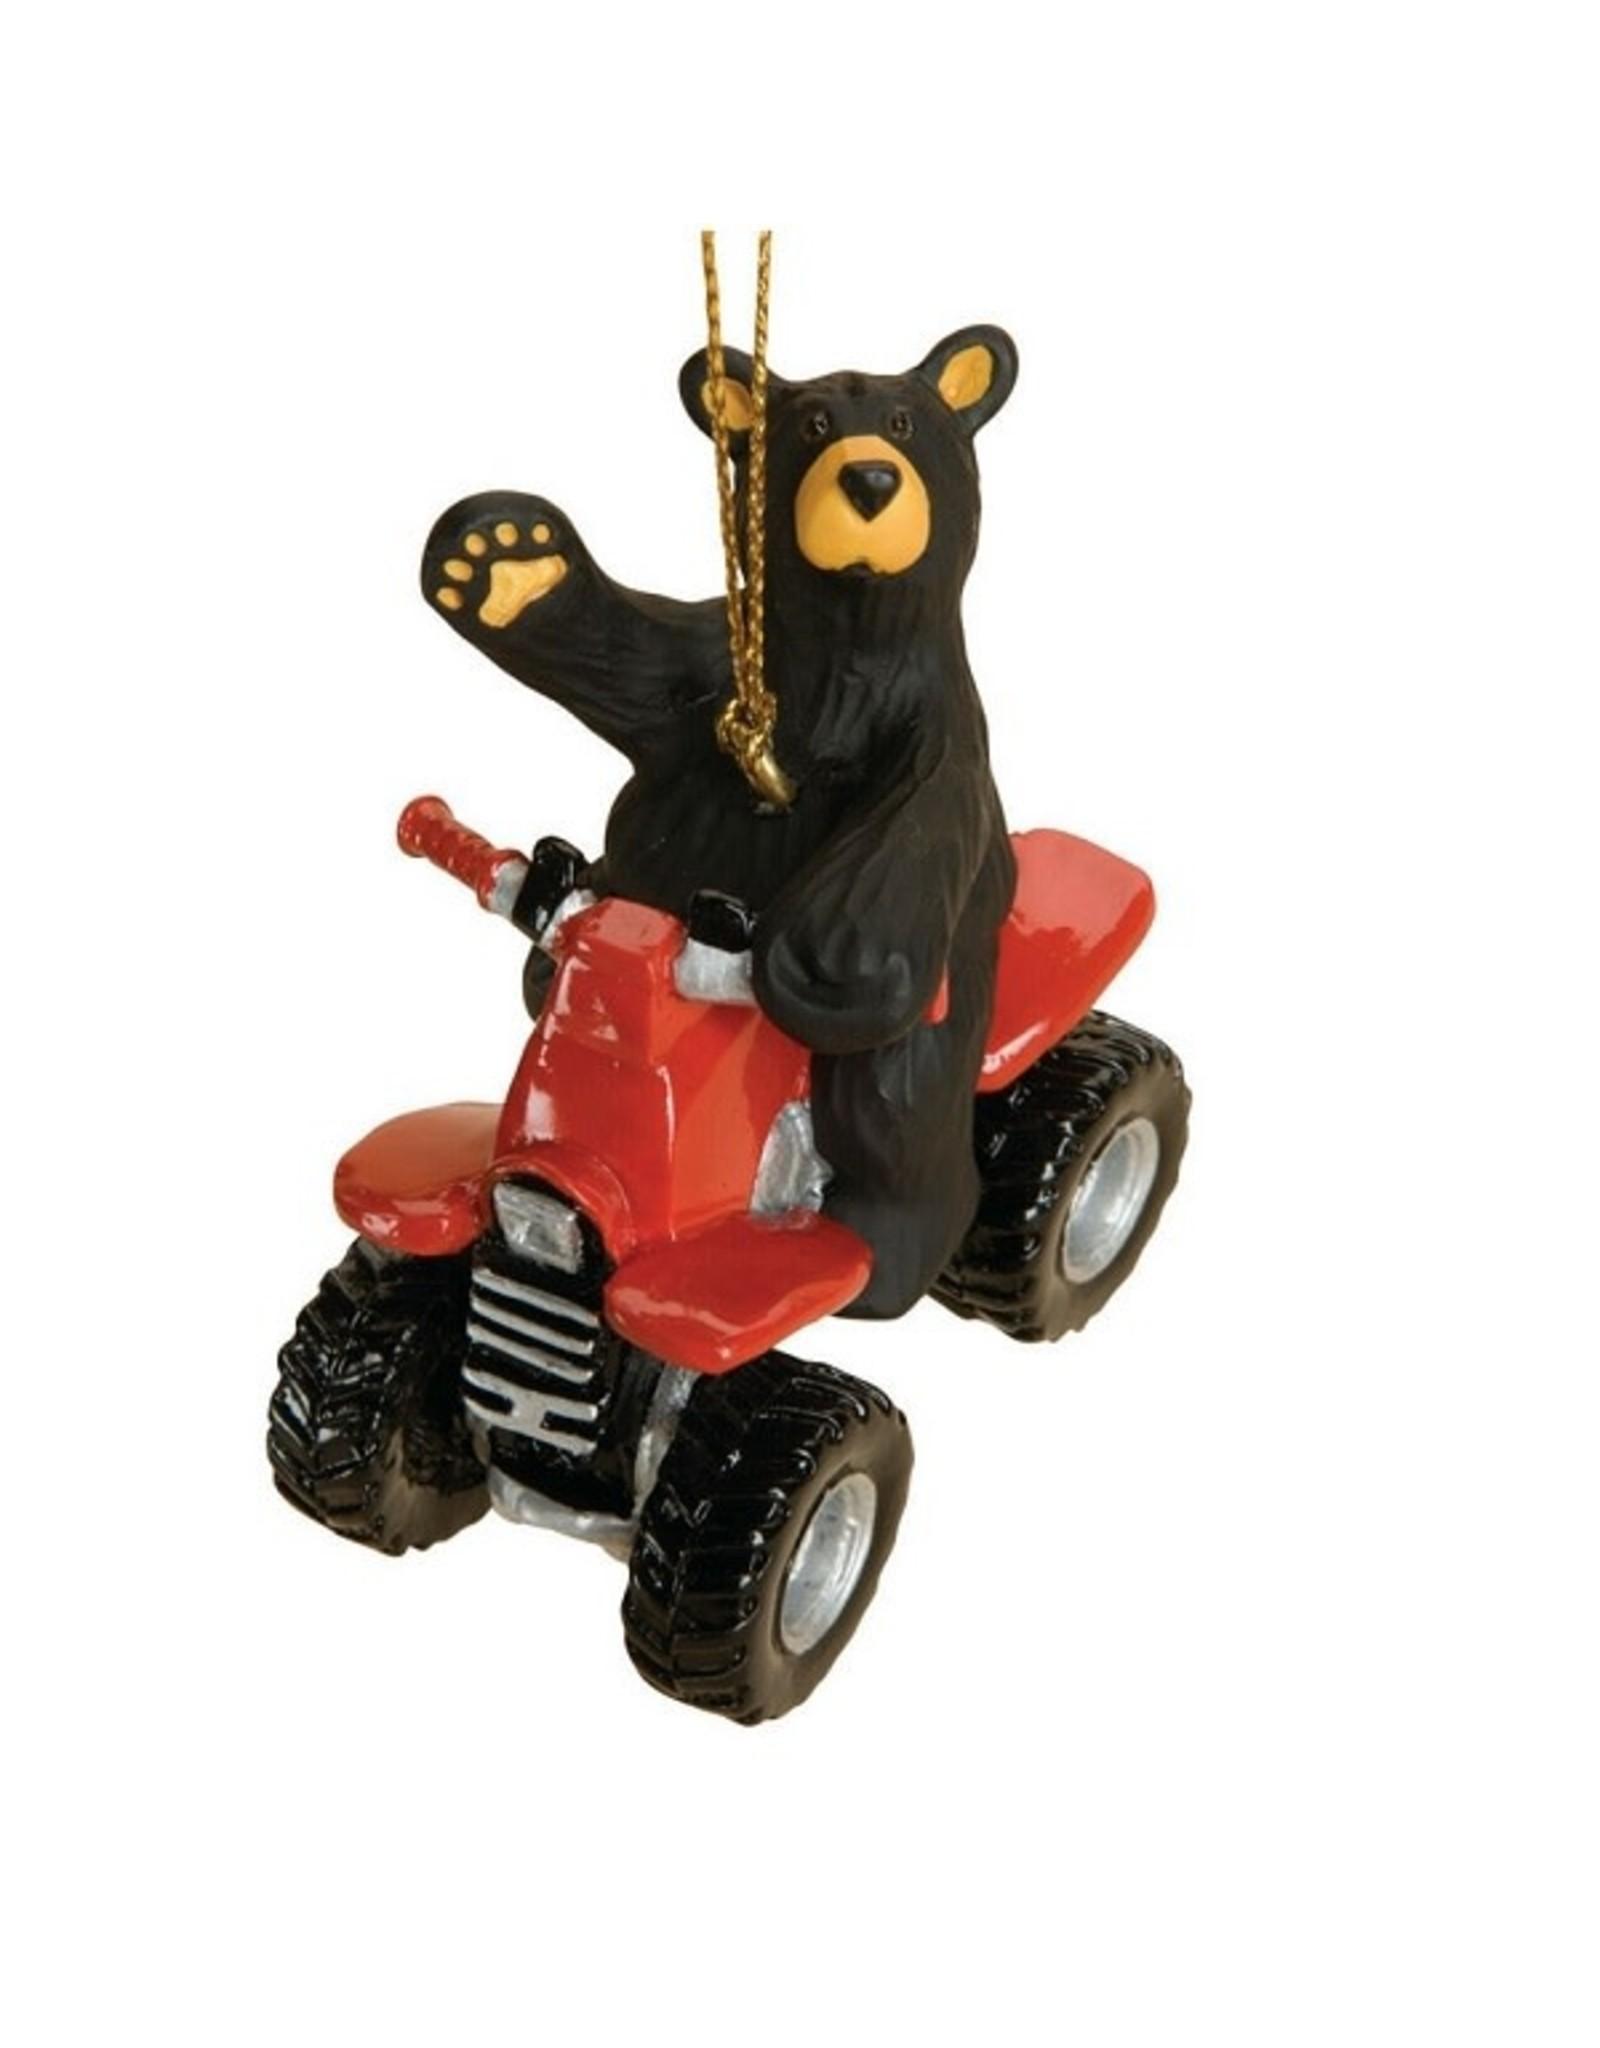 Demdaco ATV BEAR ORNAMENT